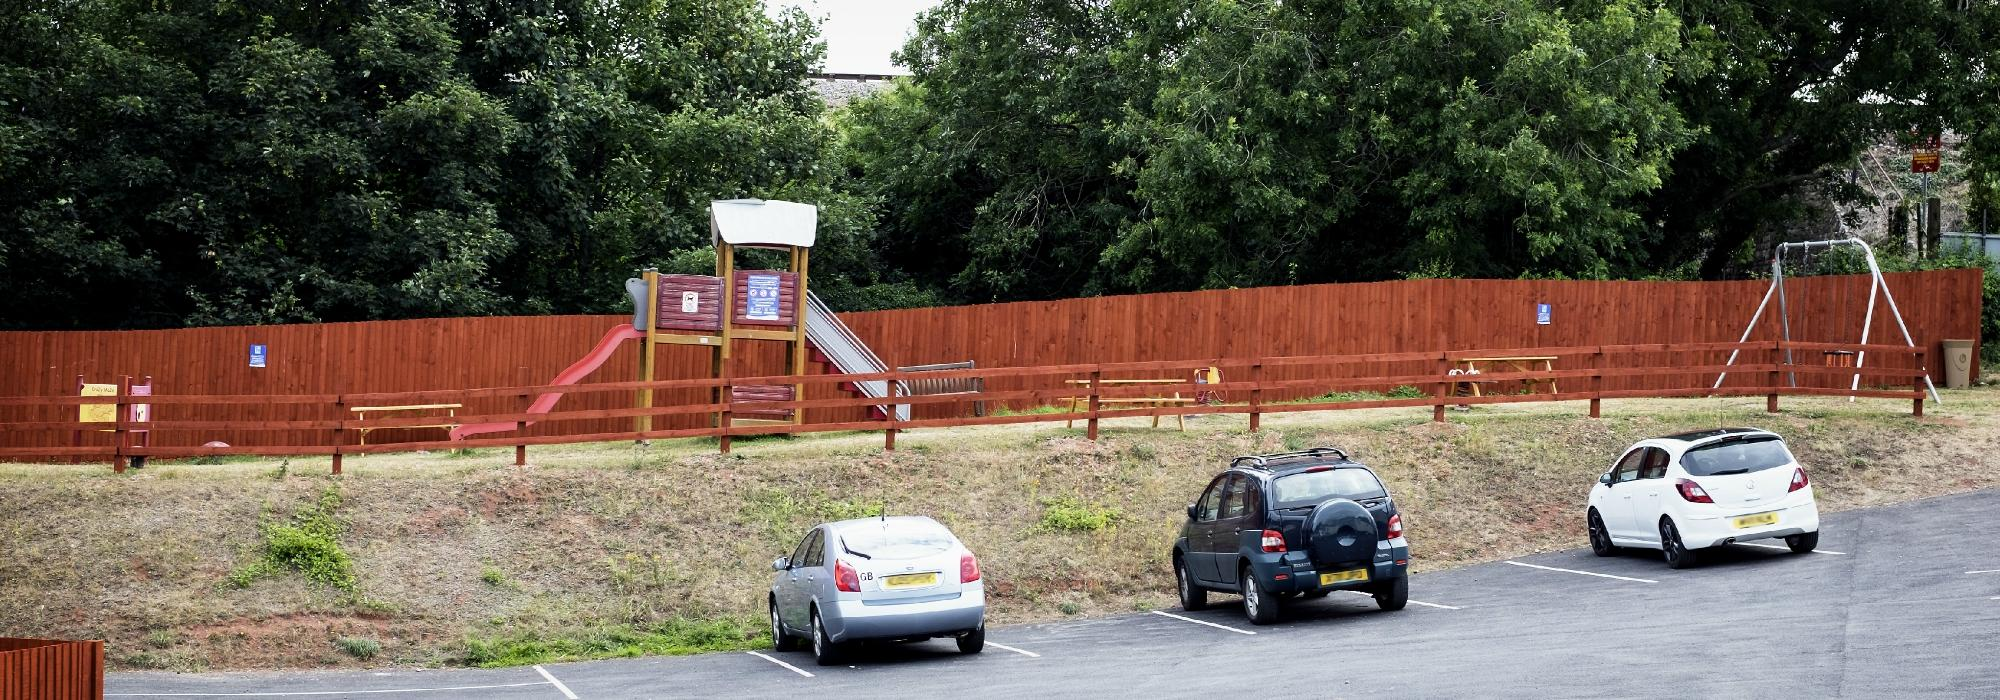 Waterside Holiday Park - Park Holidays UK